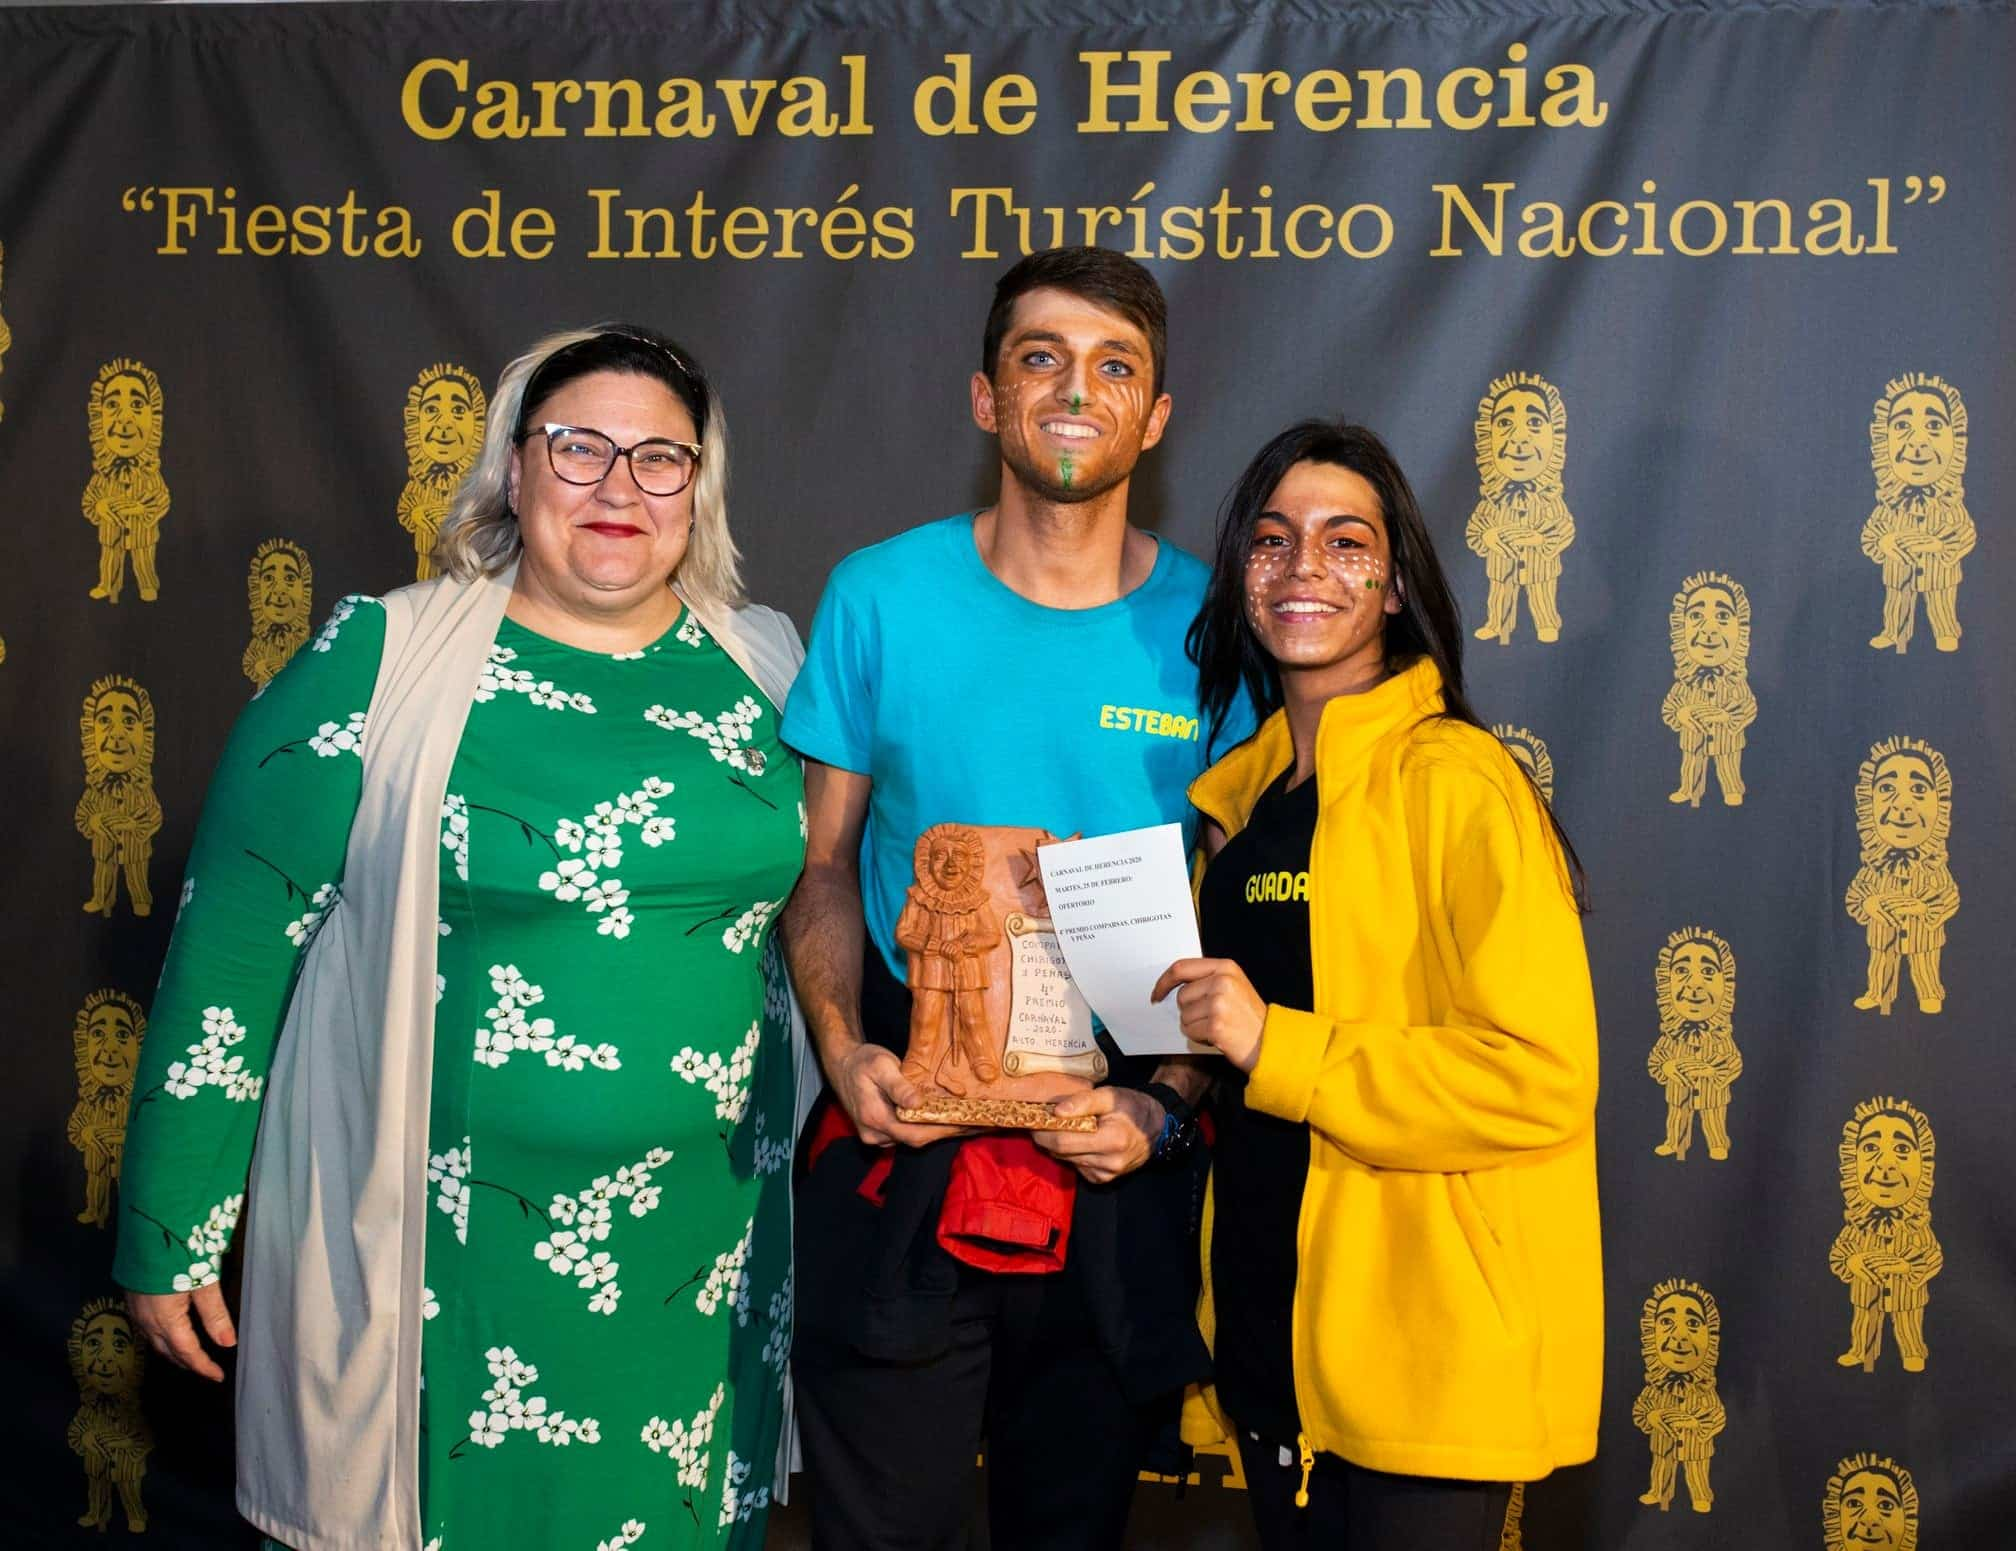 Carnaval de herencia 2020 ofertorio 126 - Selección de fotografías del Ofertorio del Carnaval de Herencia